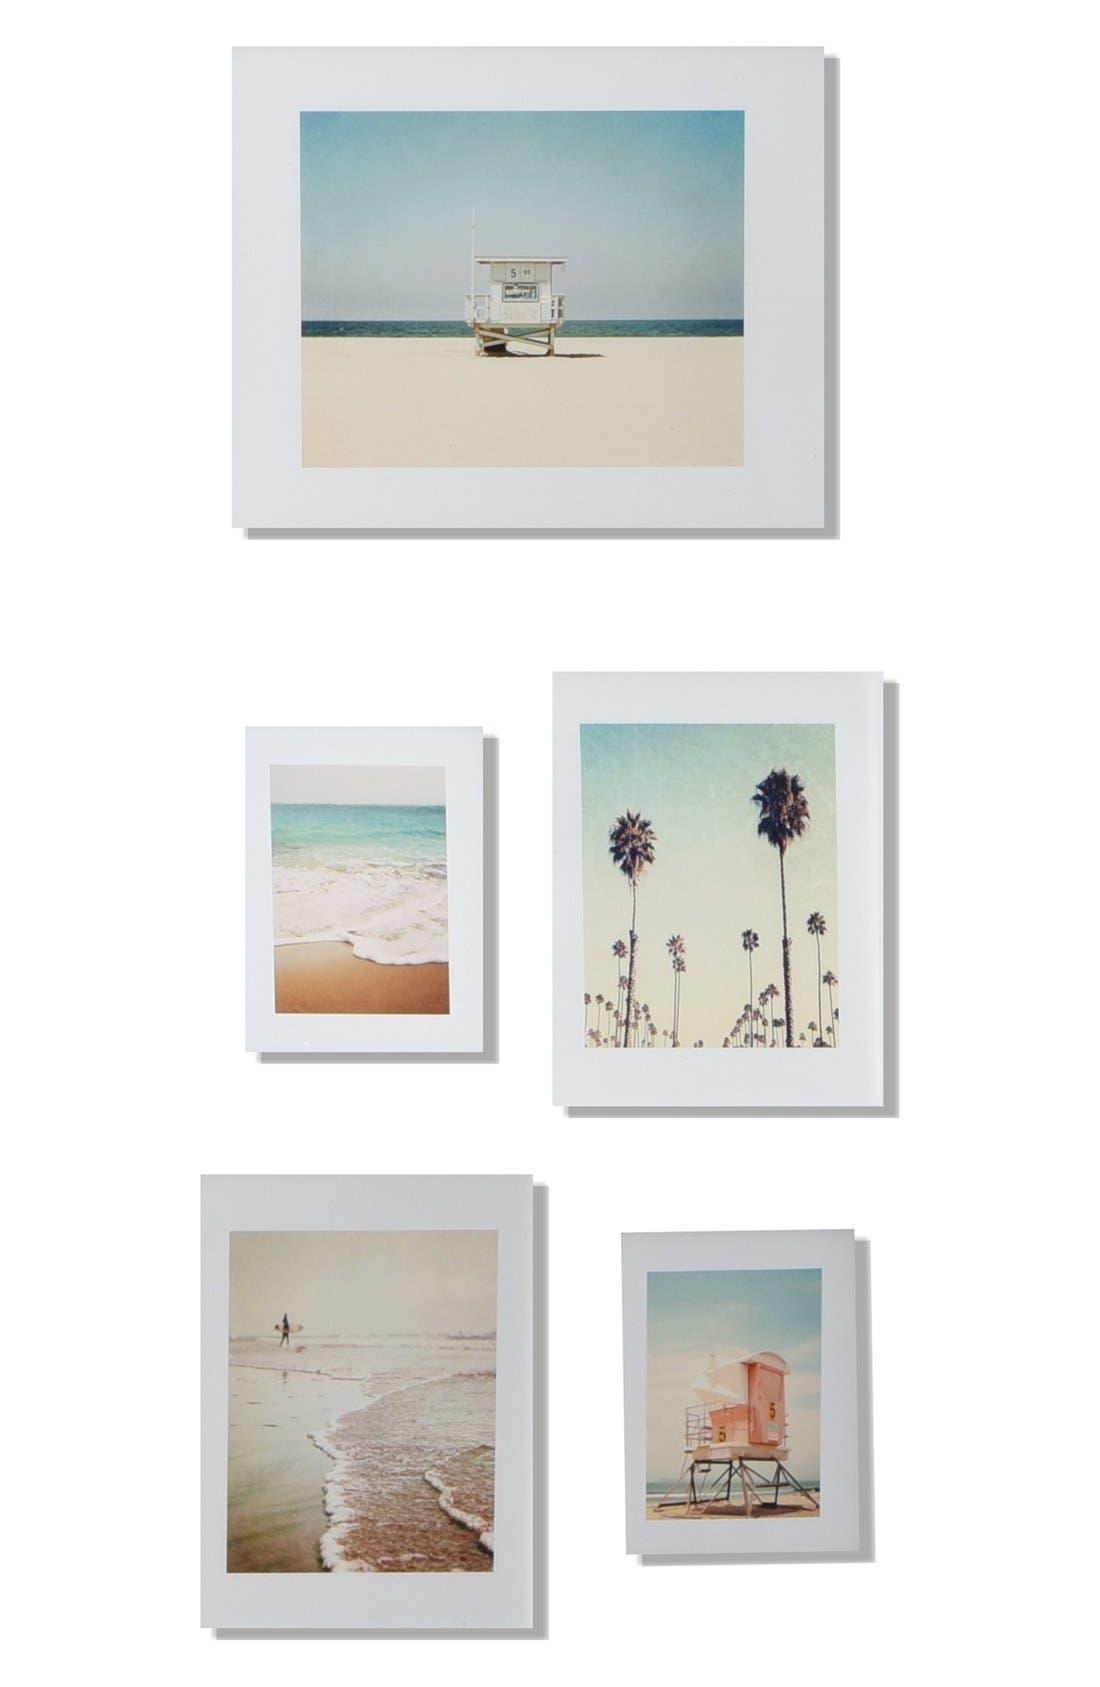 DENY DESIGNS '5th Street' Wall Art Print Set, Main, color, WHITE